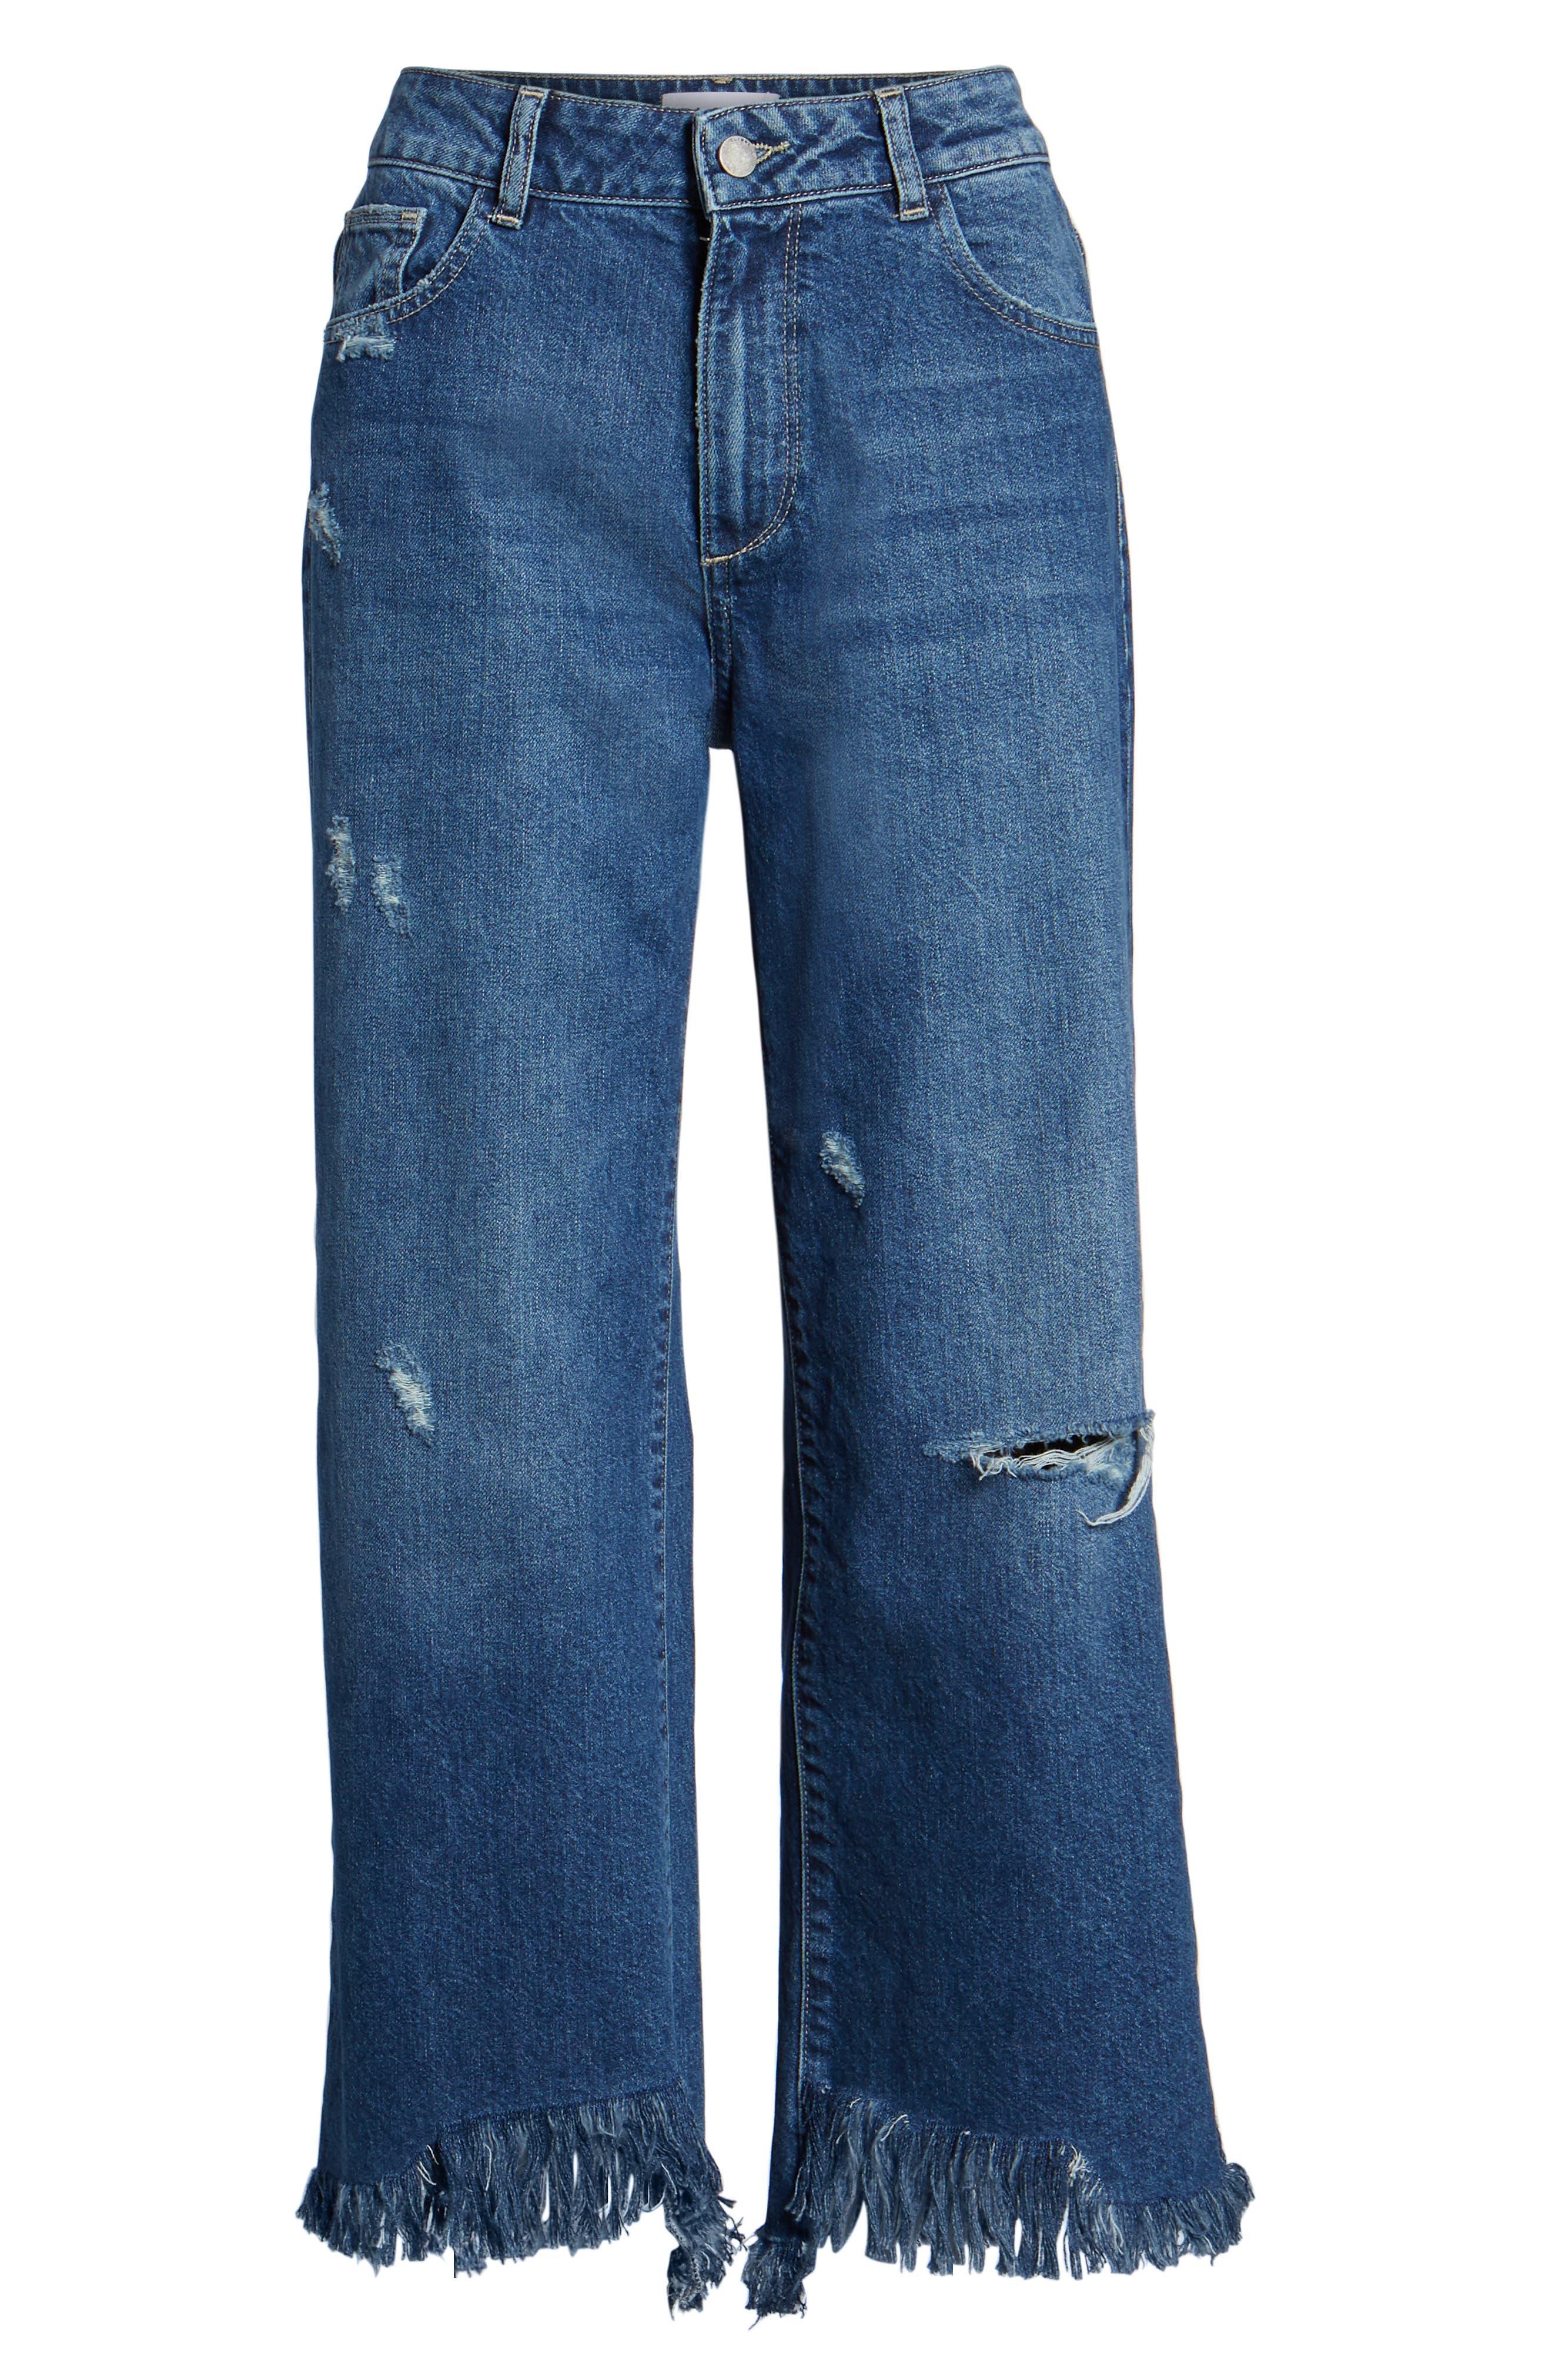 Hepburn High Waist Wide Leg Jeans,                             Alternate thumbnail 7, color,